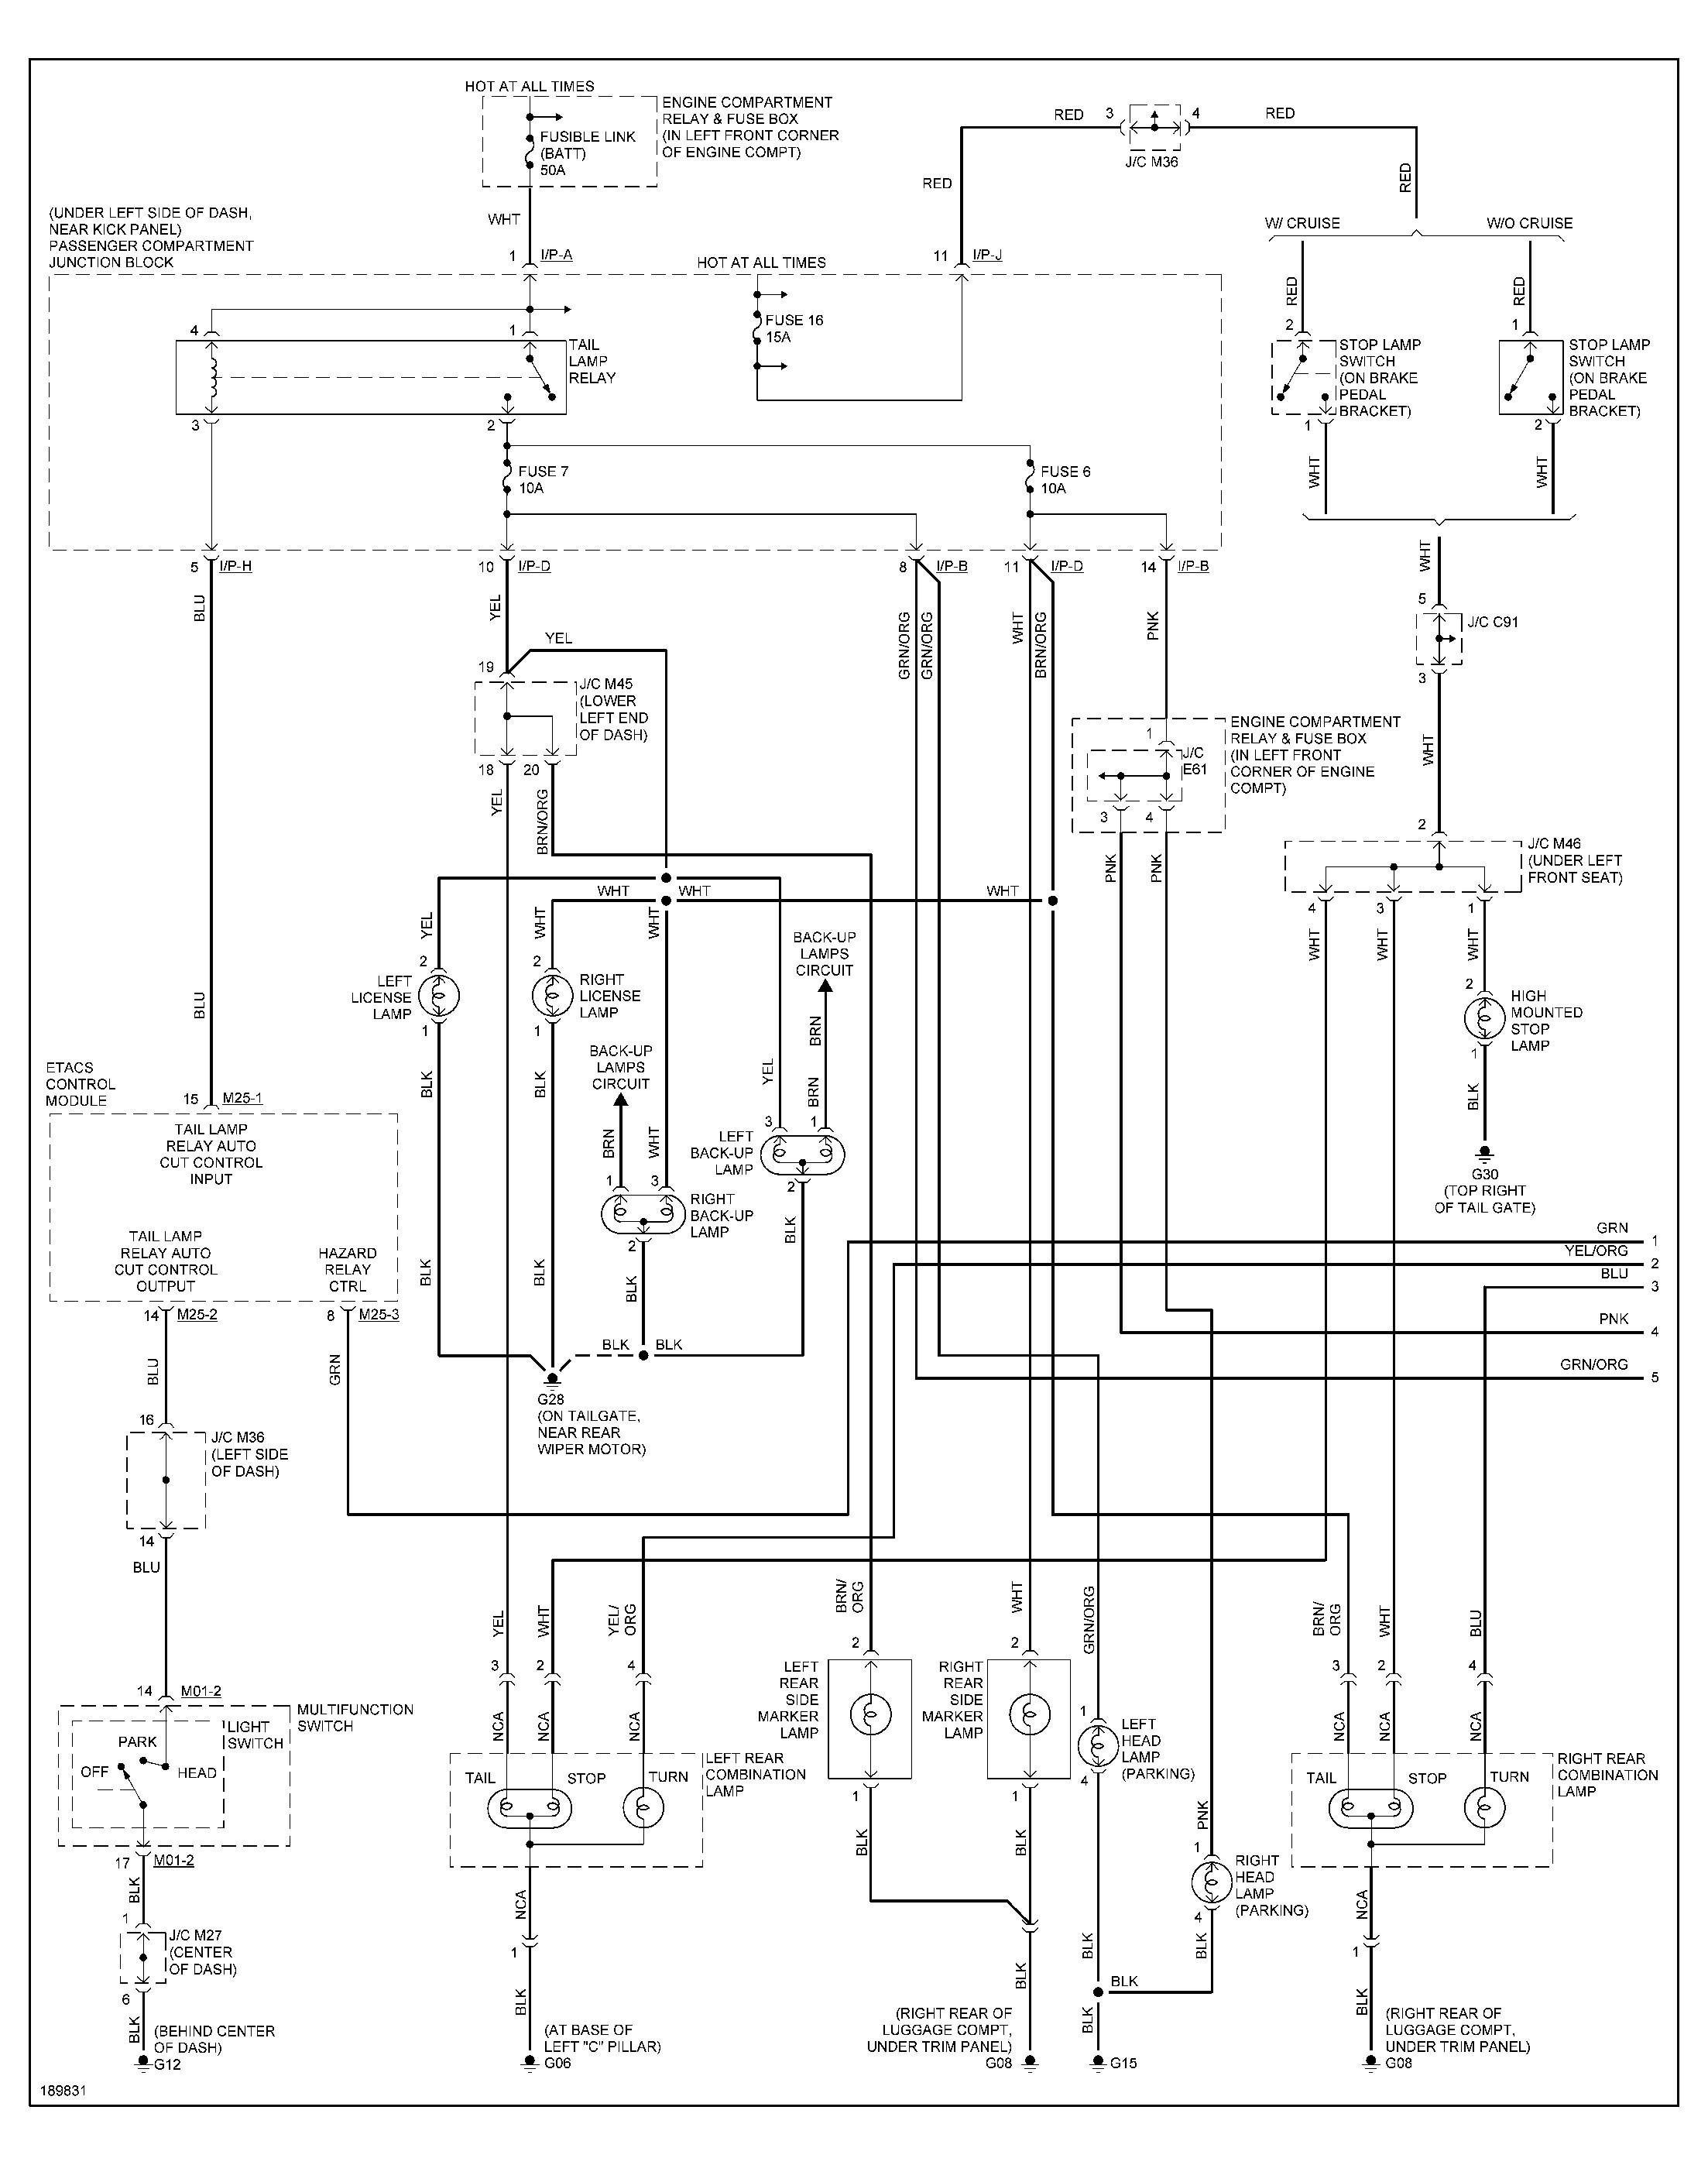 Wiring Diagram For Elantra Gt